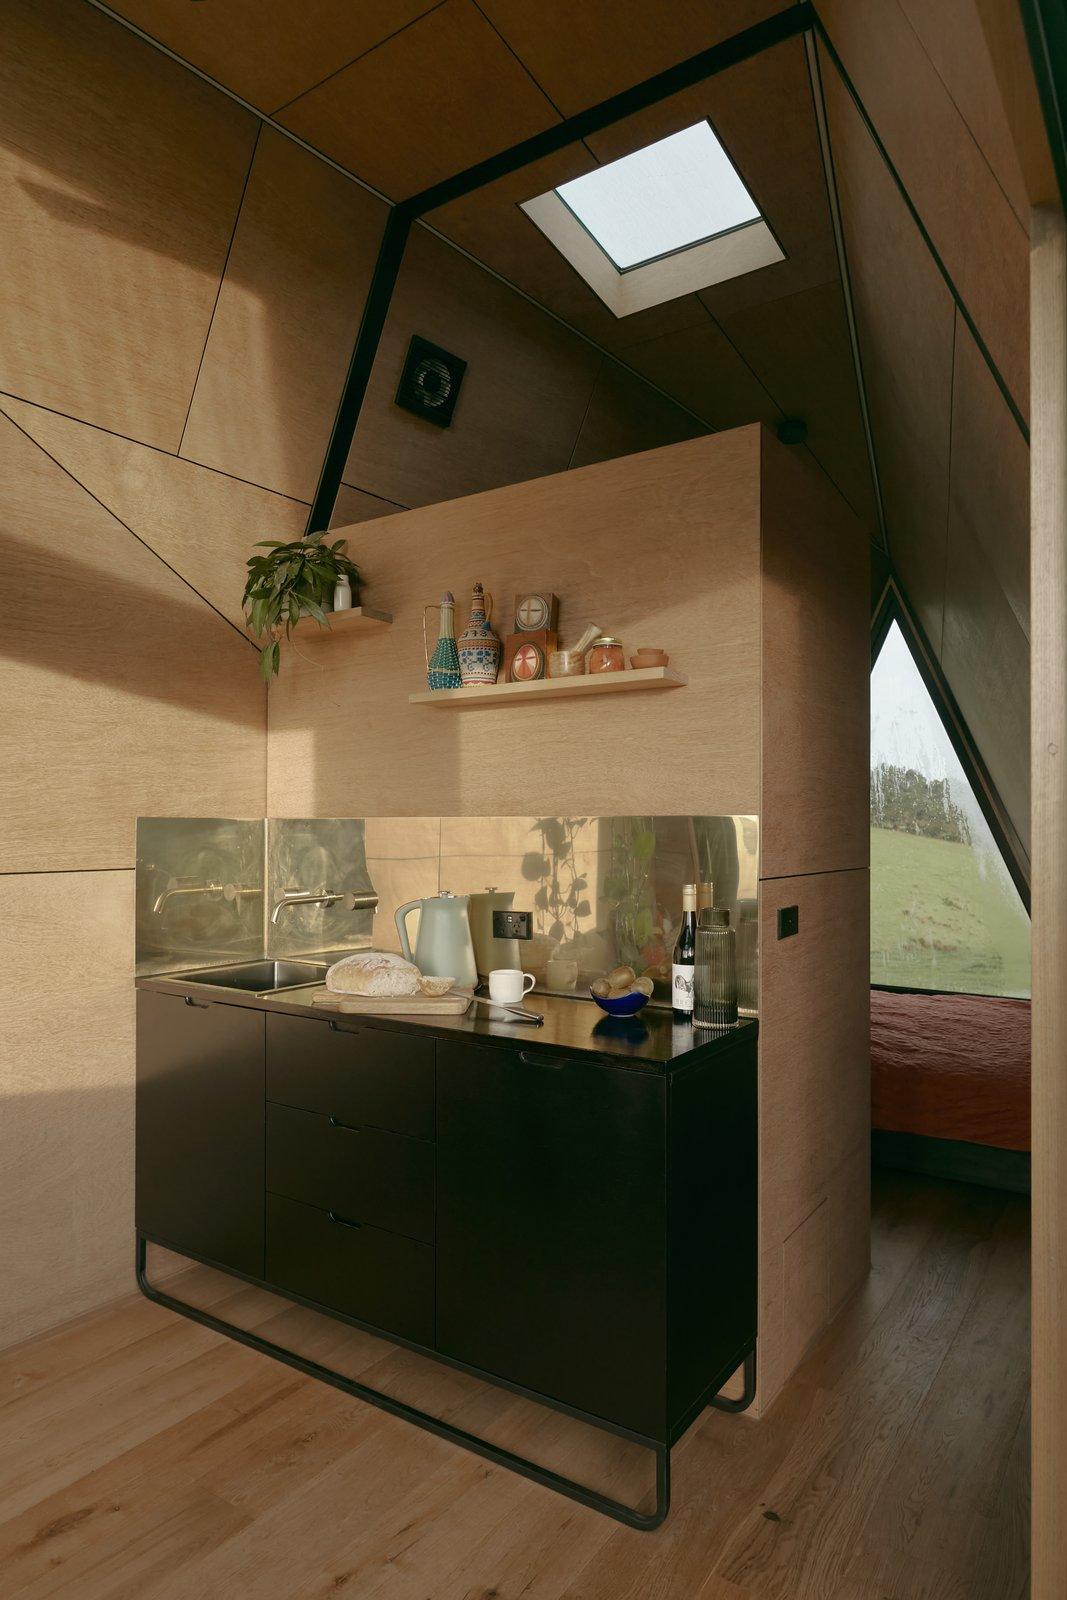 Base Cabin kitchenette